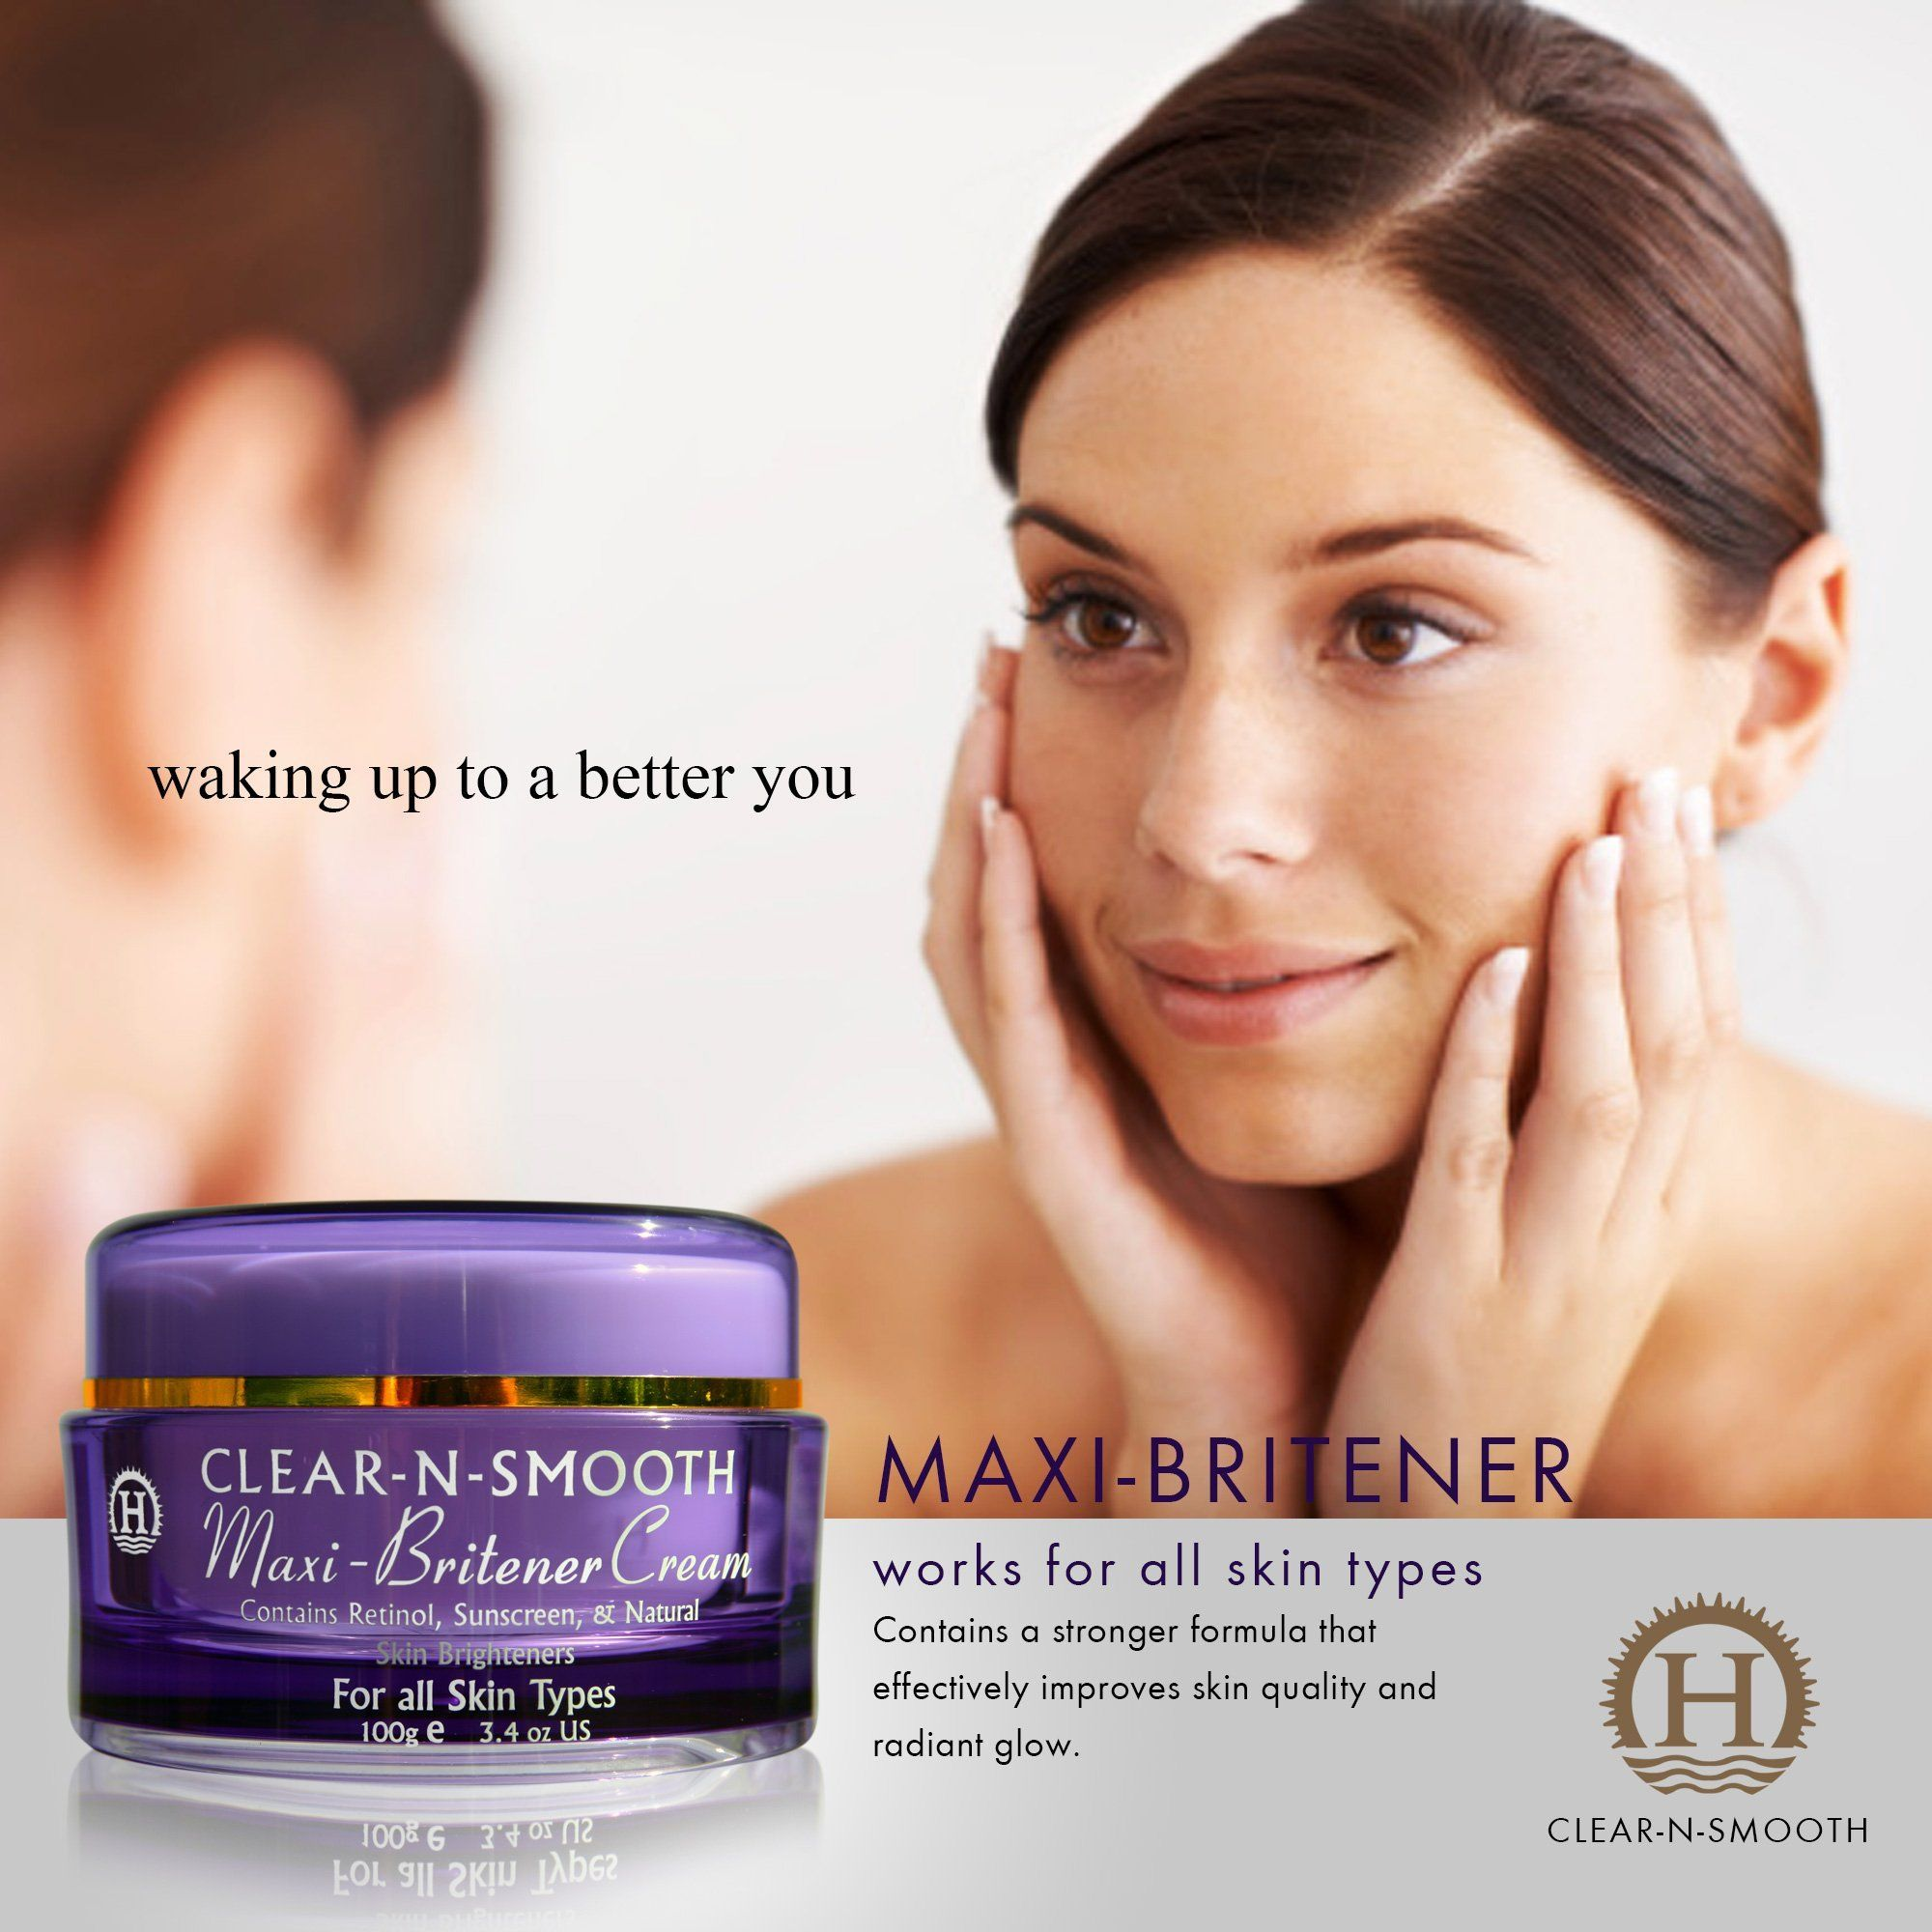 Amazon skin lightening cream stronger formula whitening and